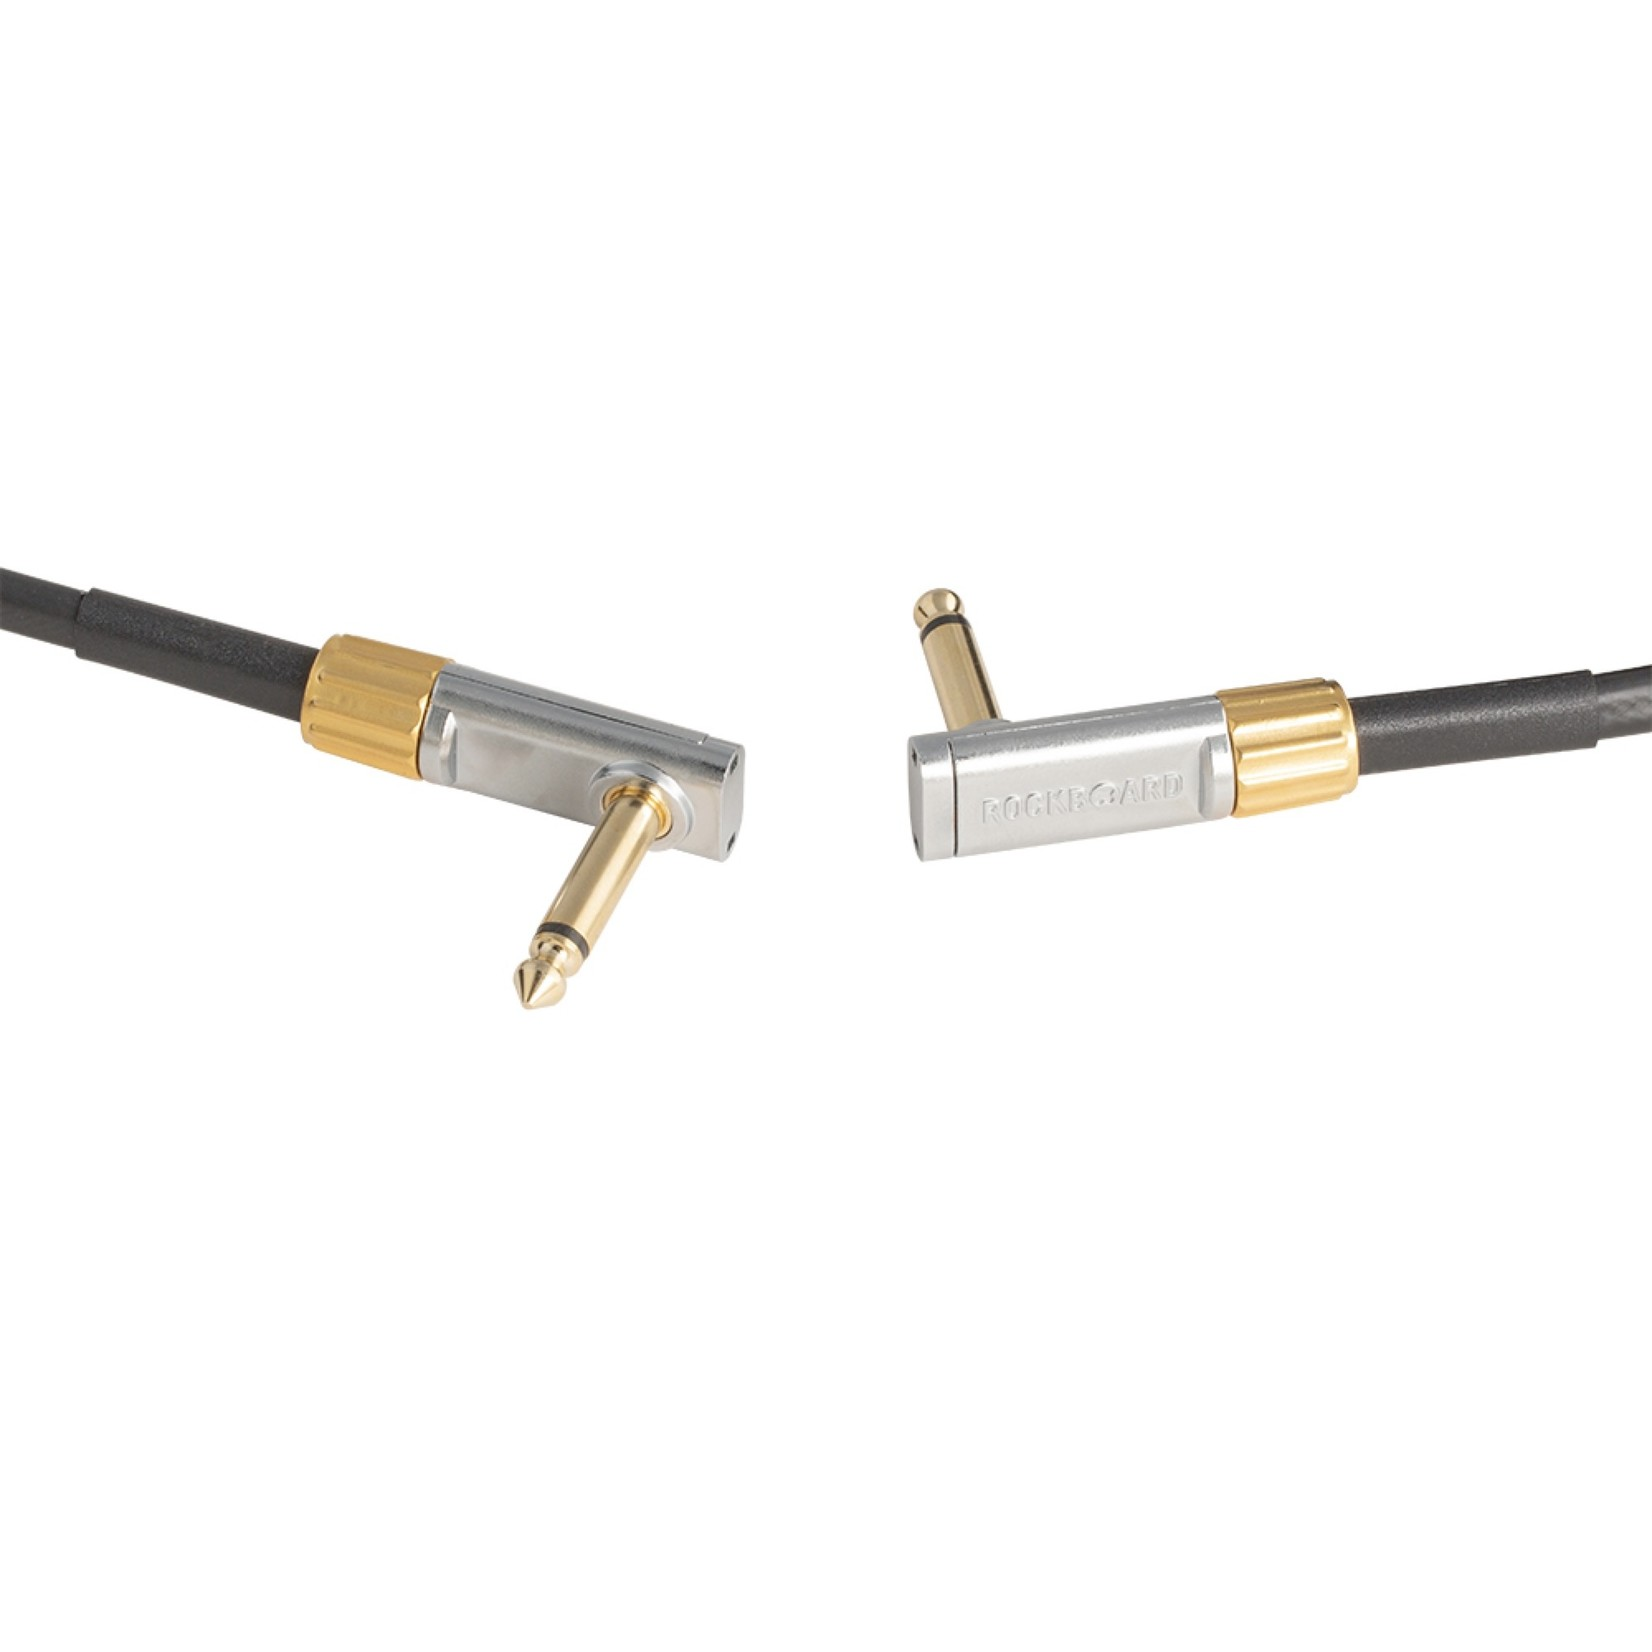 Rockboard RockBoard PREMIUM Flat Instrument Cable, 600 cm / 19.7 ft., angled/angled